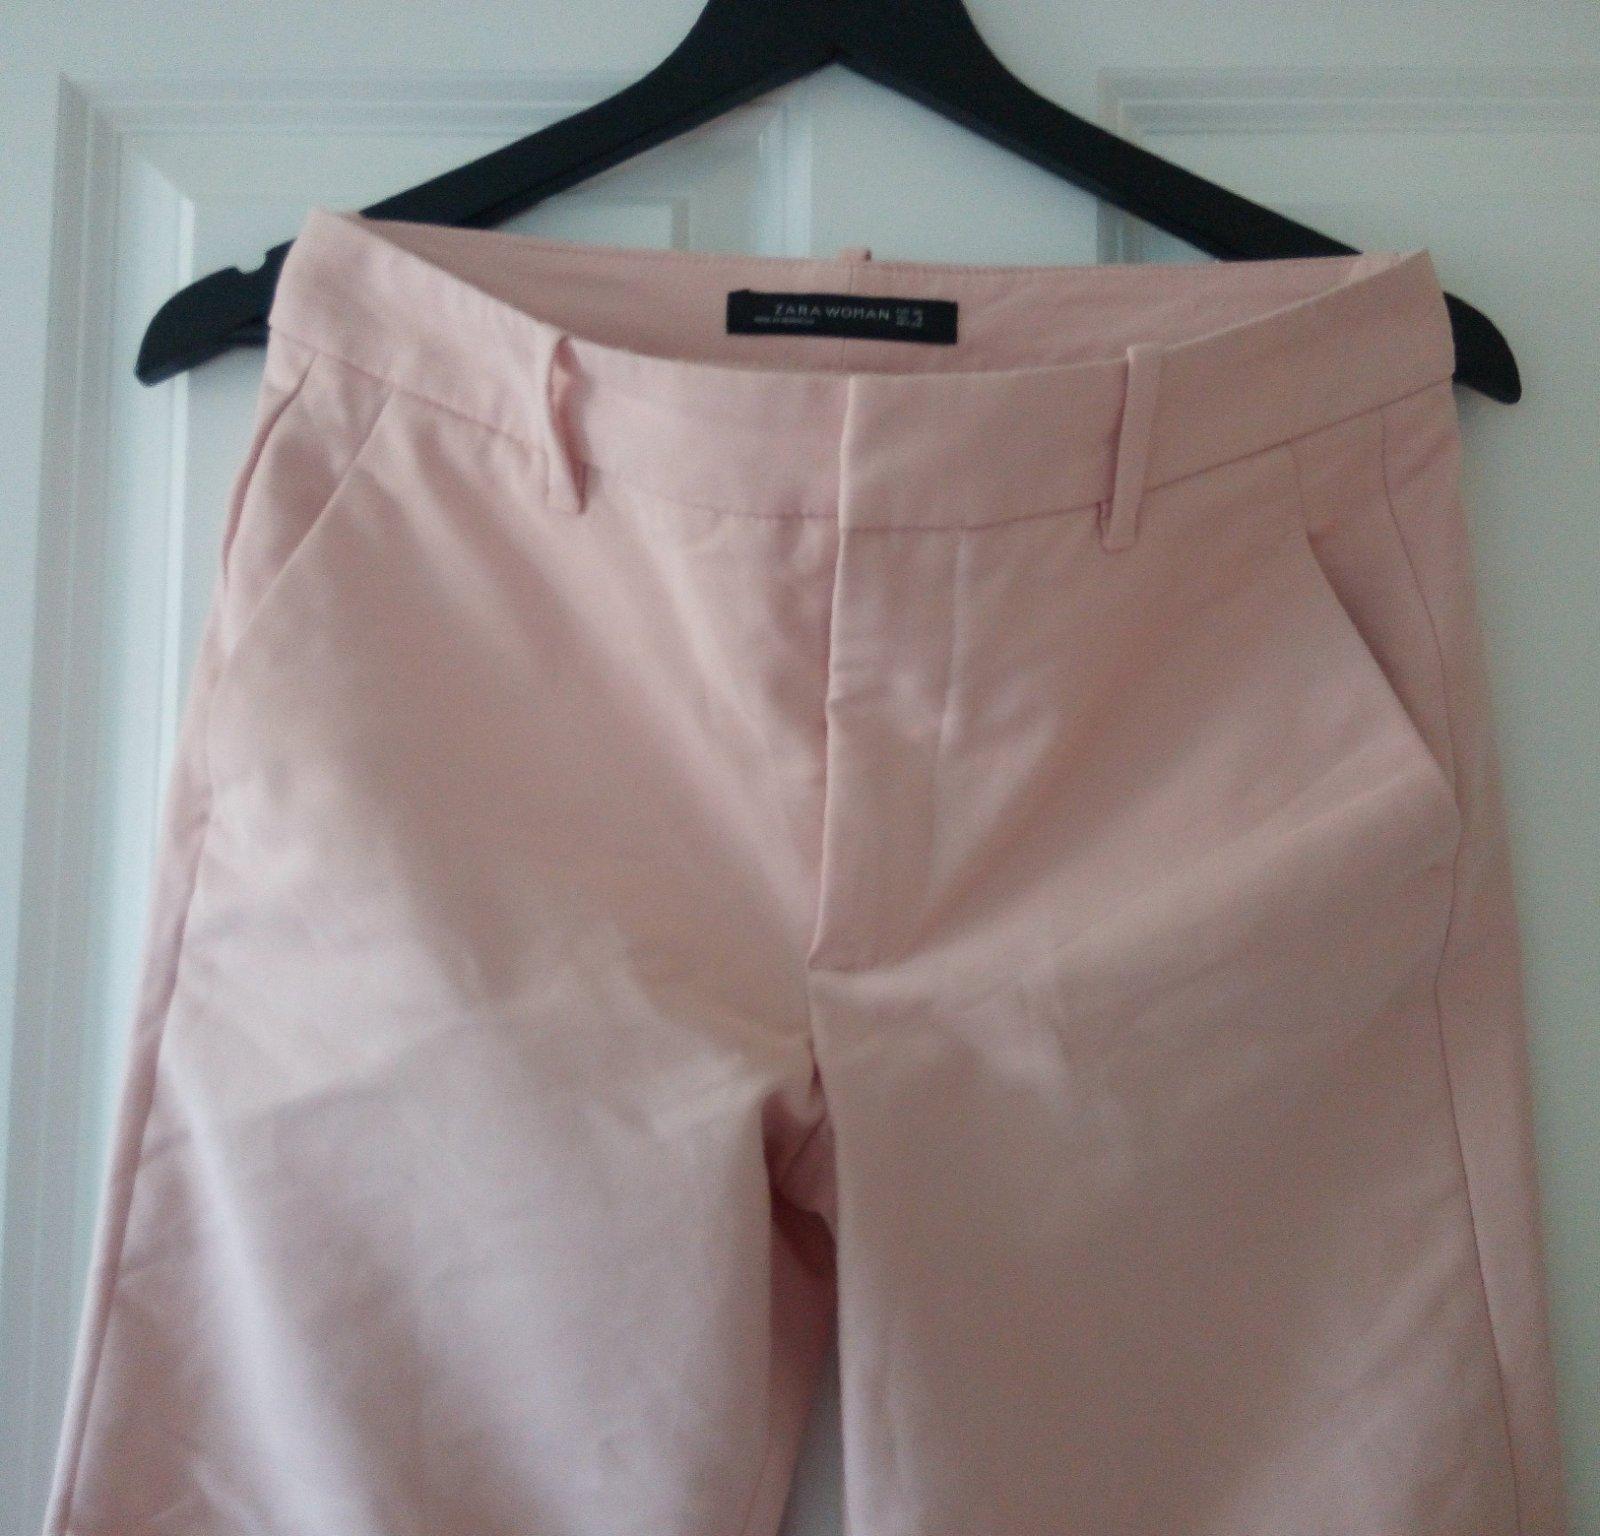 Bledoružové nohavice Zara S - Obrázok č. 4